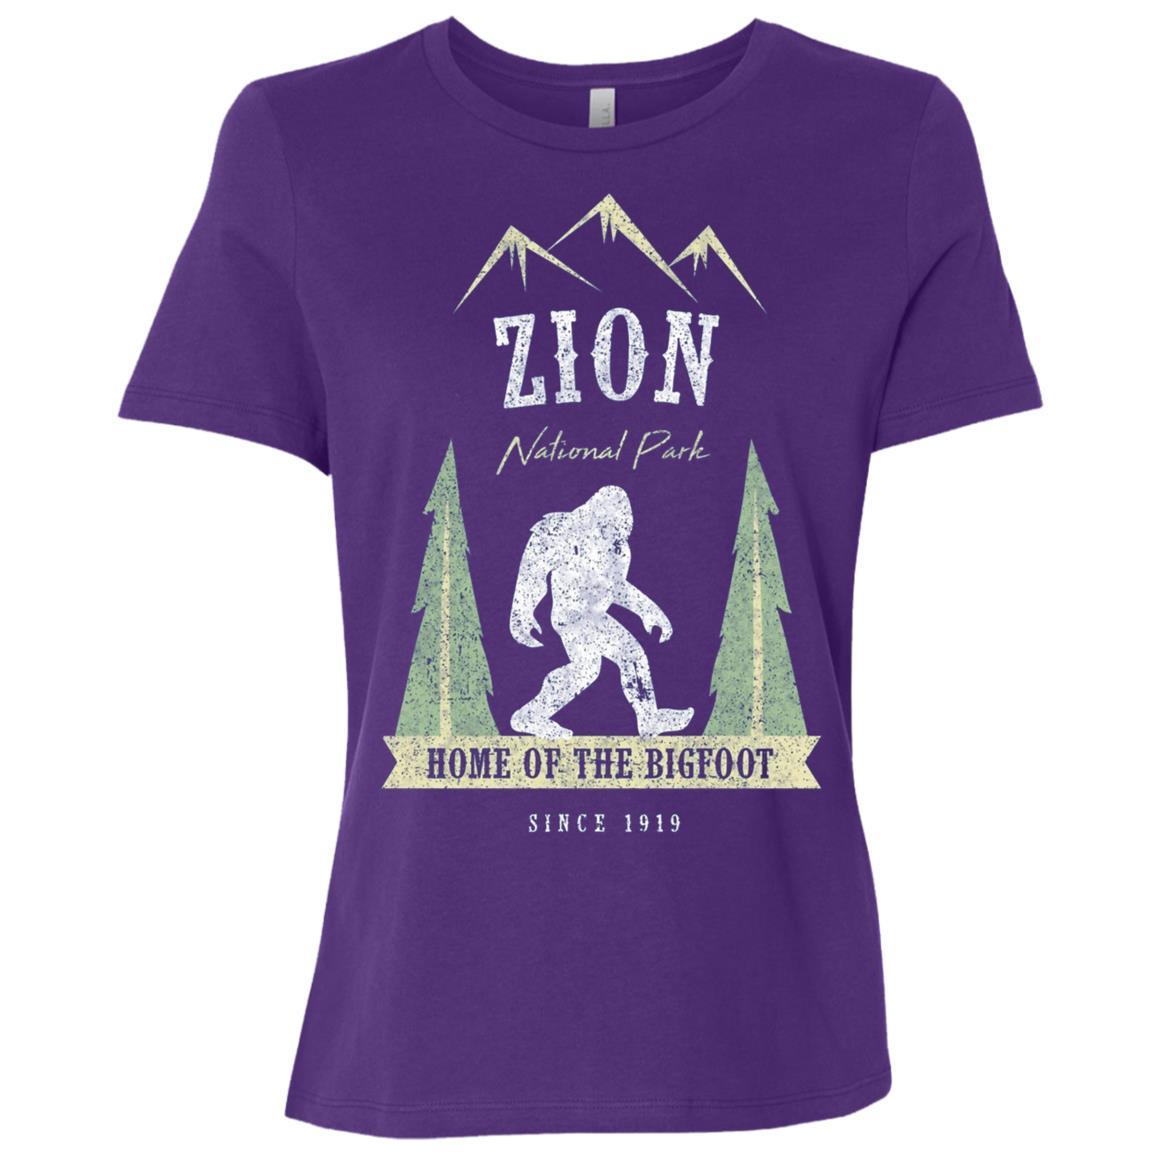 Zion National Park Vintage Bigfoot Utah Gift Women Short Sleeve T-Shirt